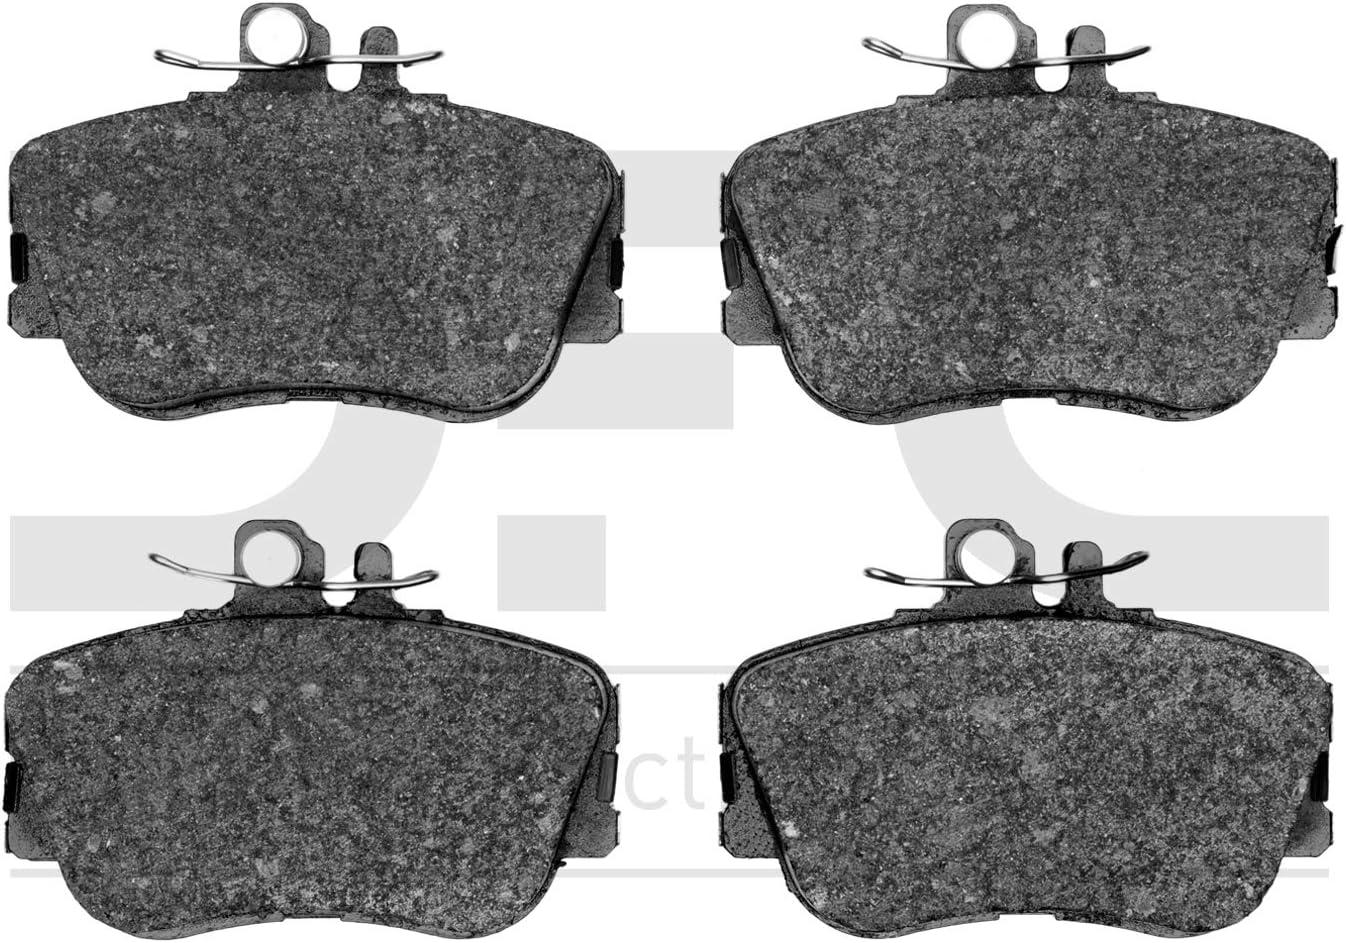 Dynamic Friction Company 5000 outlet Euro 1600-0645- Ceramic Brake unisex Pads